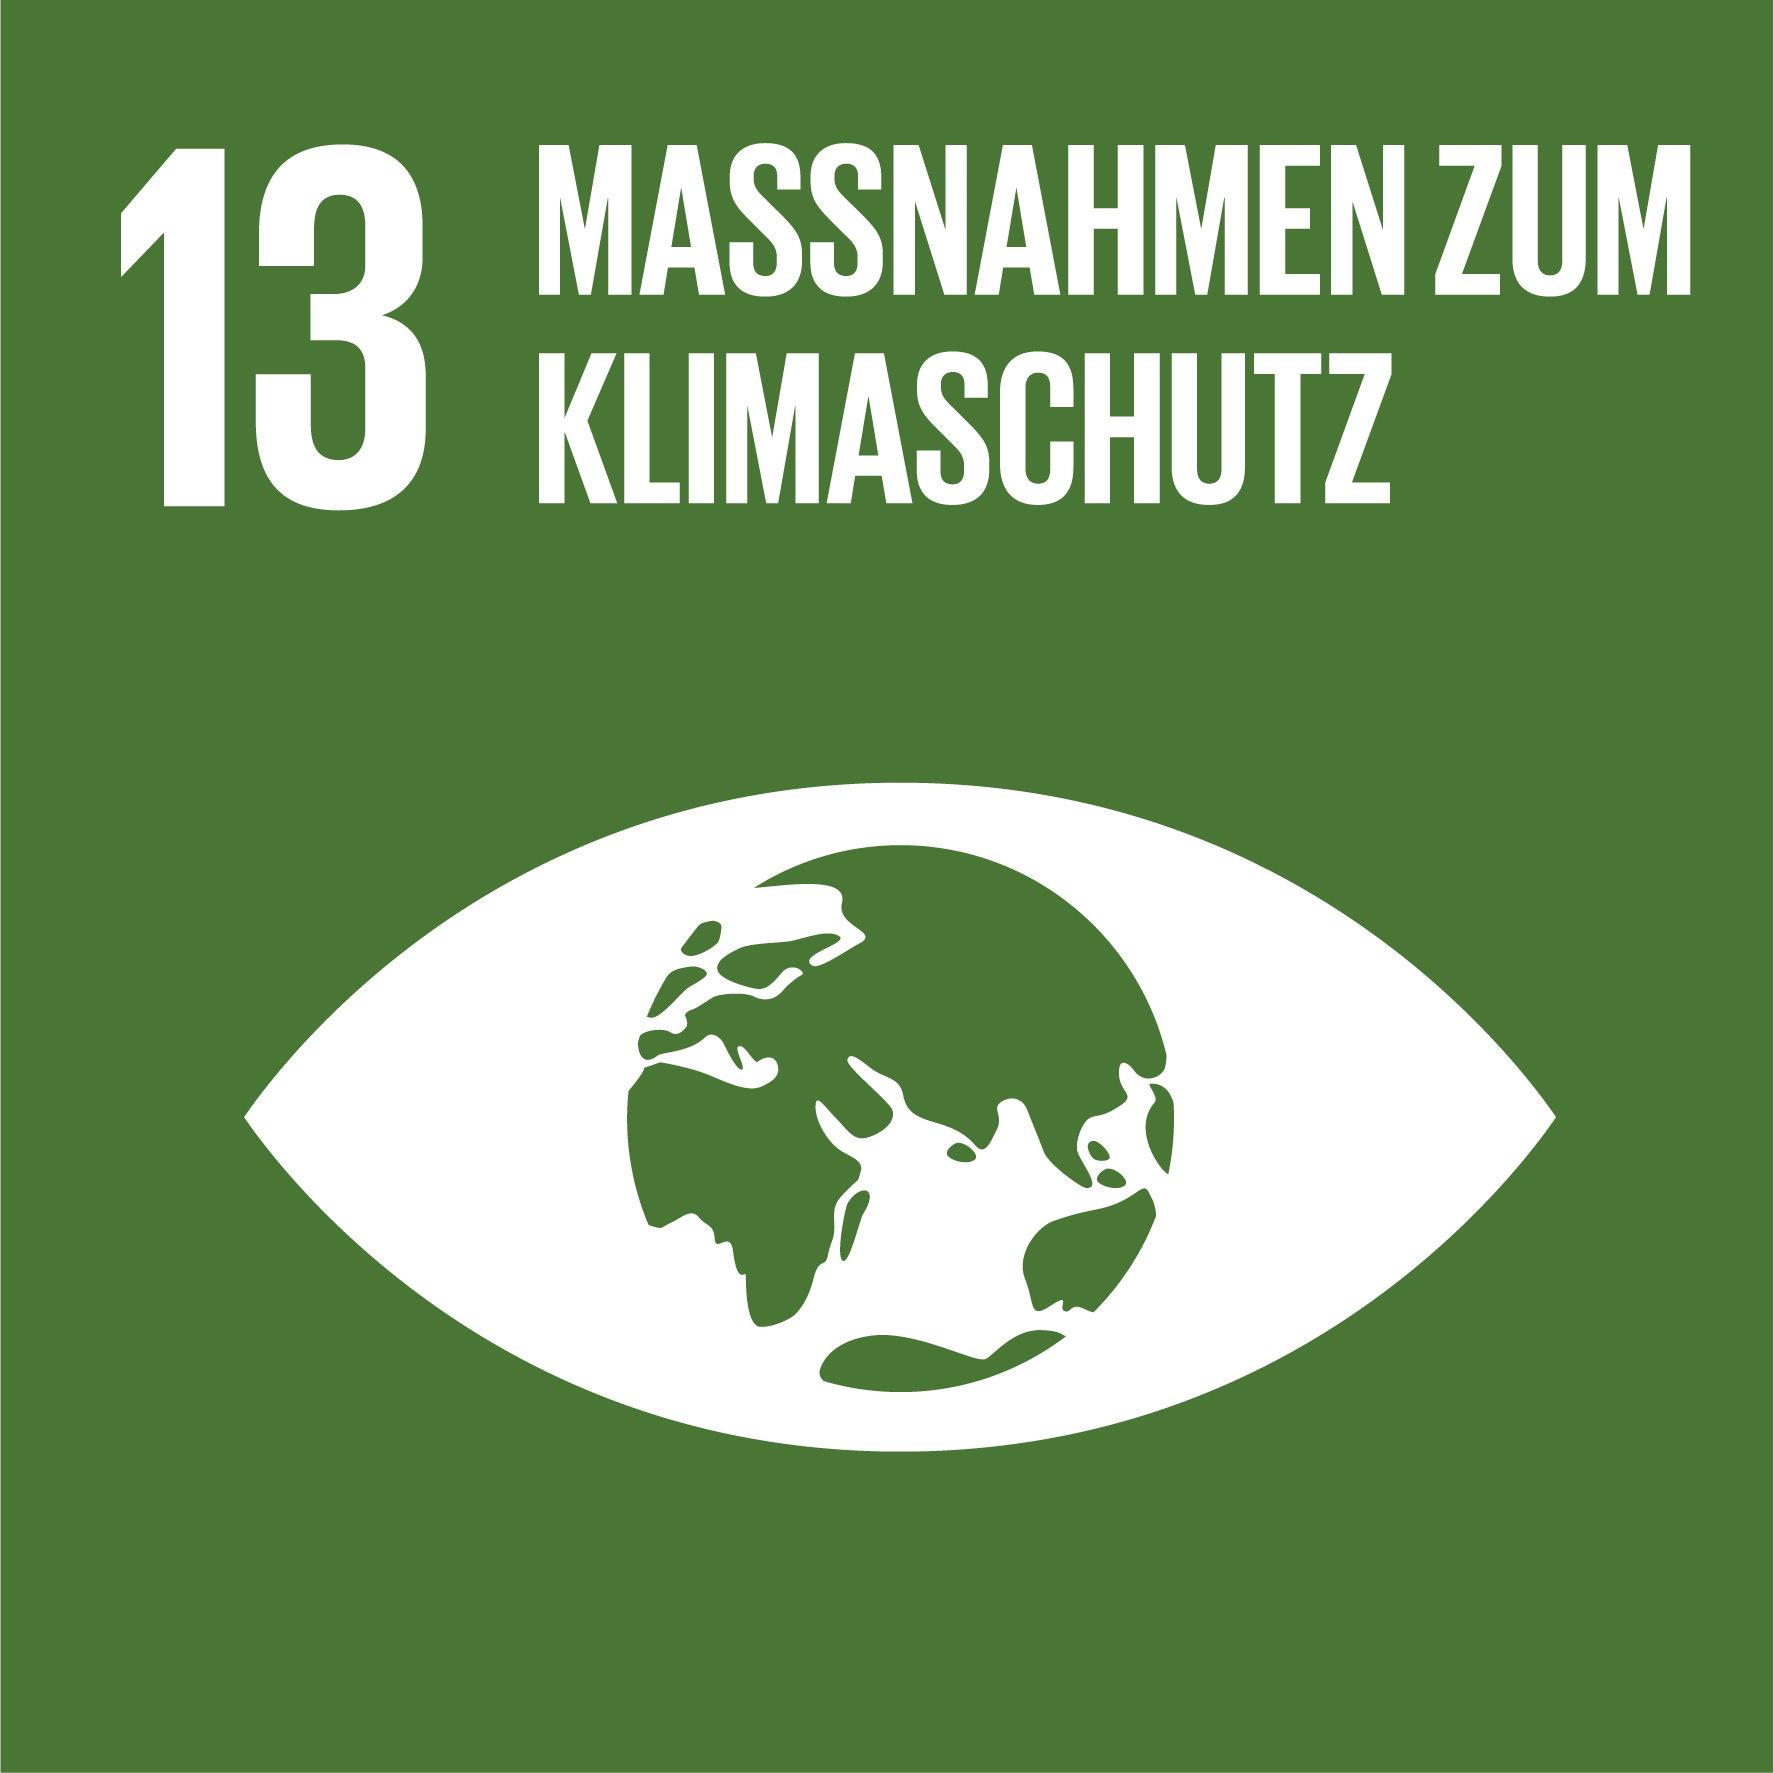 Regensburger Nachhaltigkeitswoche - SDG 13